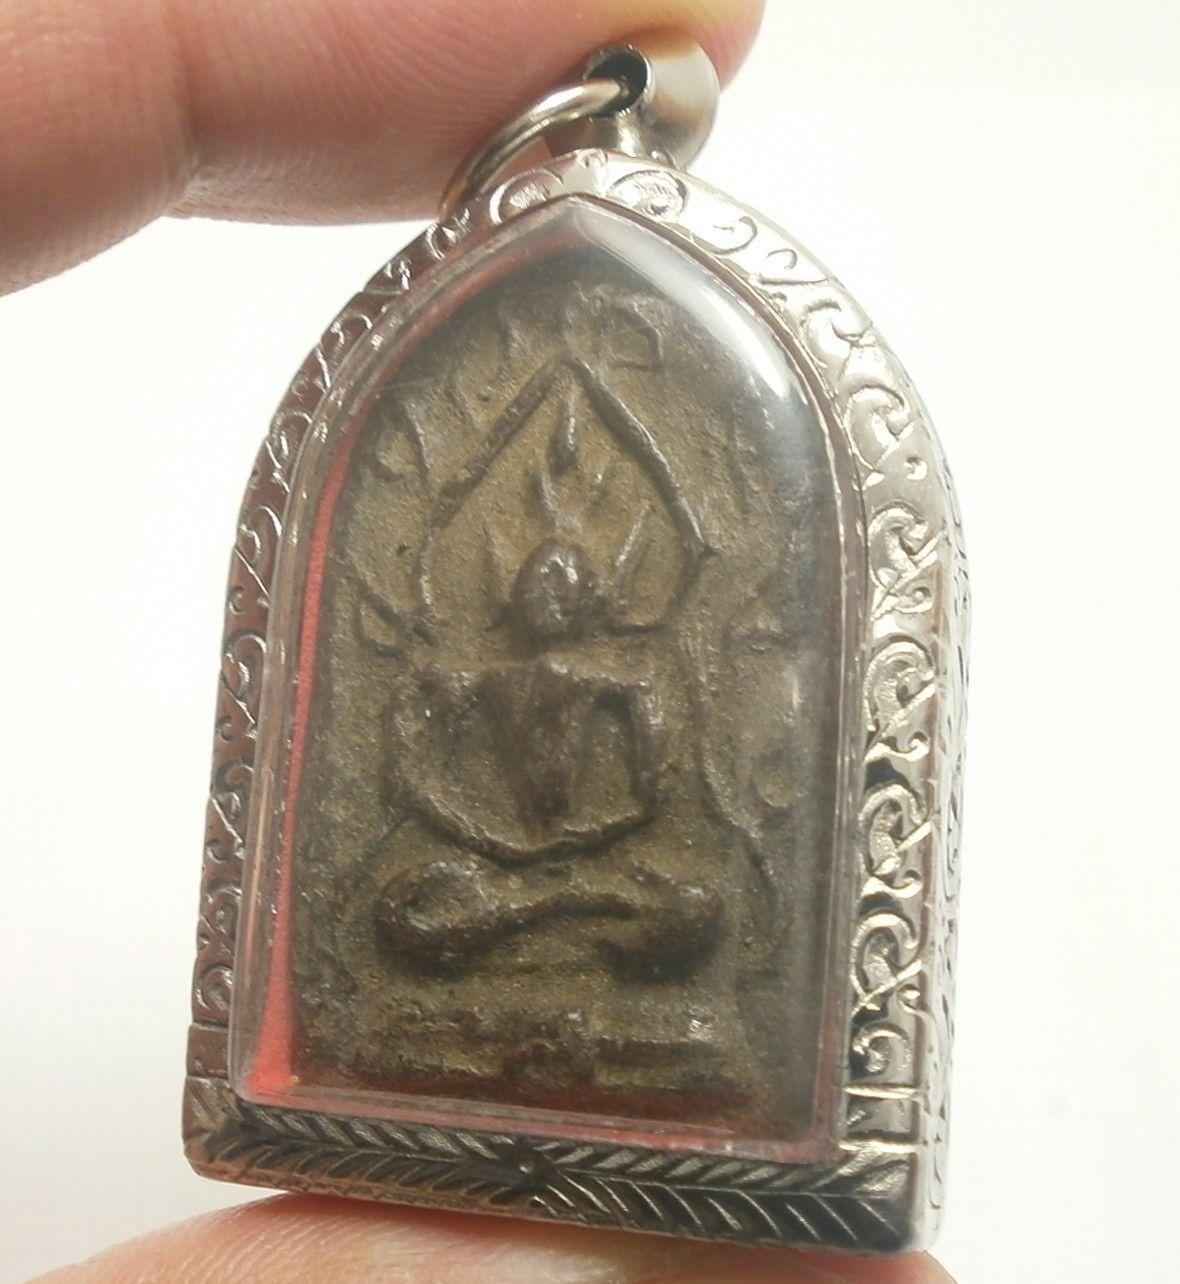 LP BOON BUDDHA IN NIRVANA ENLIGHTEN SHIELD THAI POWERFUL ANTIQUE AMULET PENDANT image 2